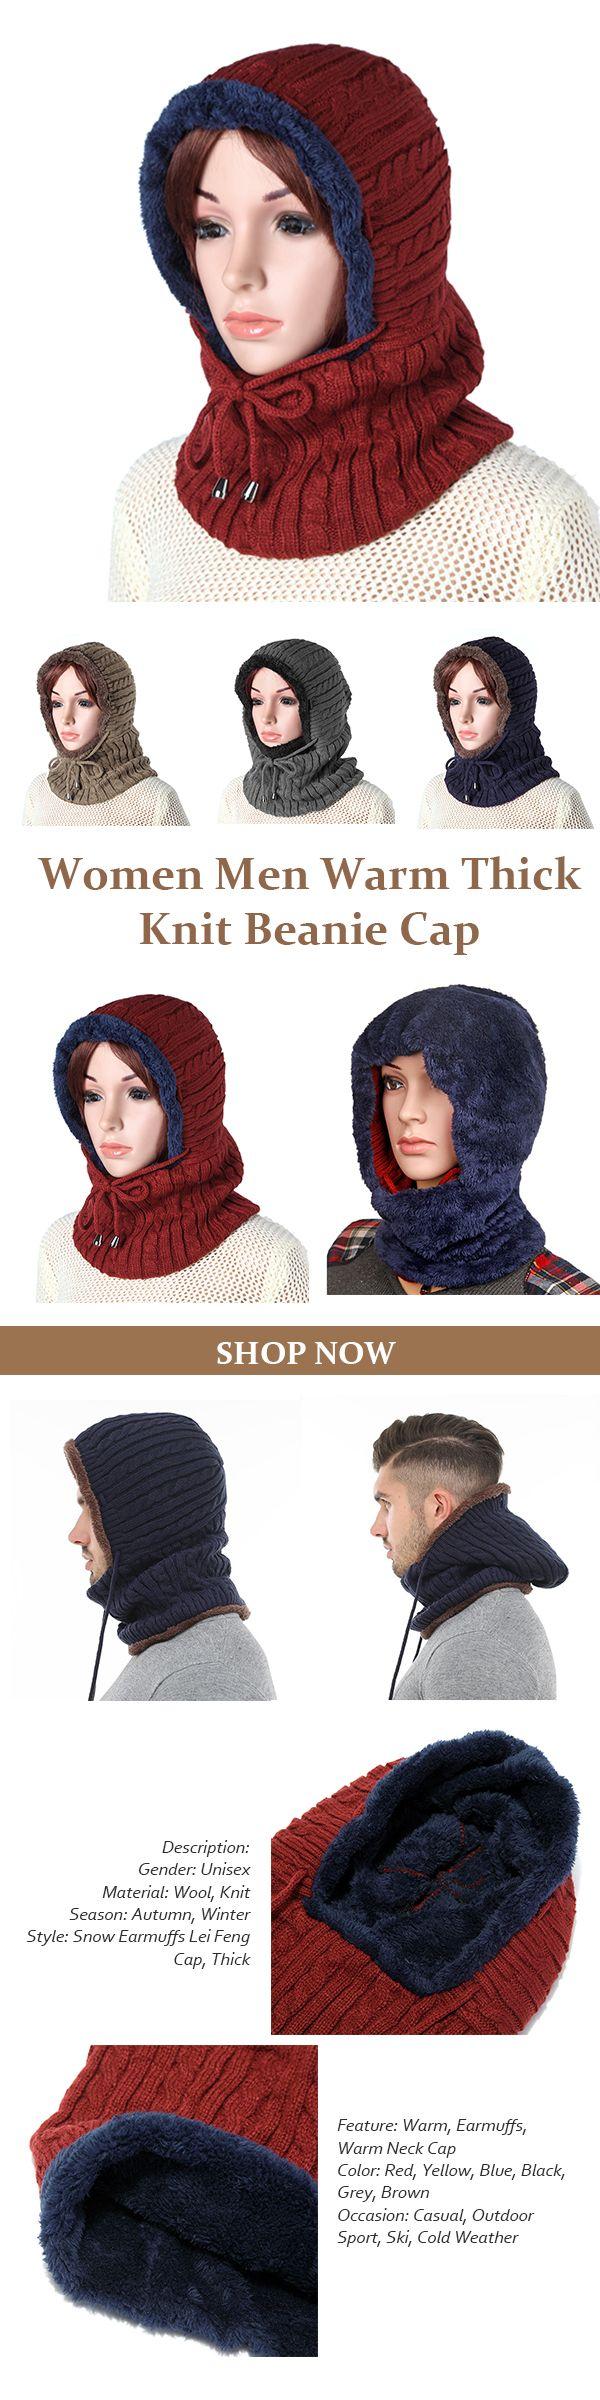 Women Men Warm Thick Knit Beanie Cap With Earmuffs Hooded Scarf Windproof Hooded Neck Warmer Cap